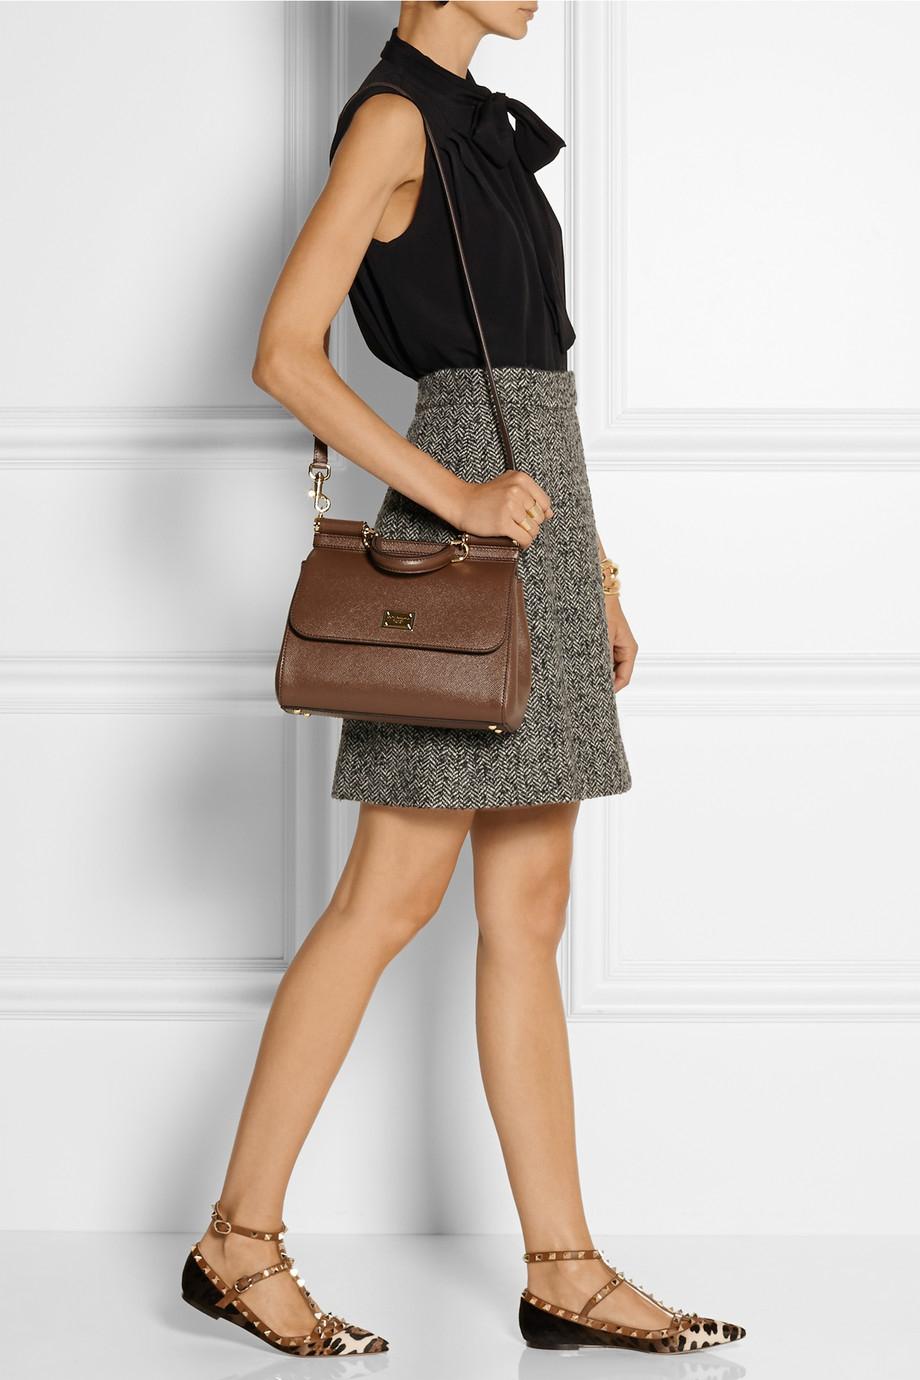 7646832f8 Dolce & Gabbana Sicily Medium Textured-Leather Shoulder Bag in Brown ...